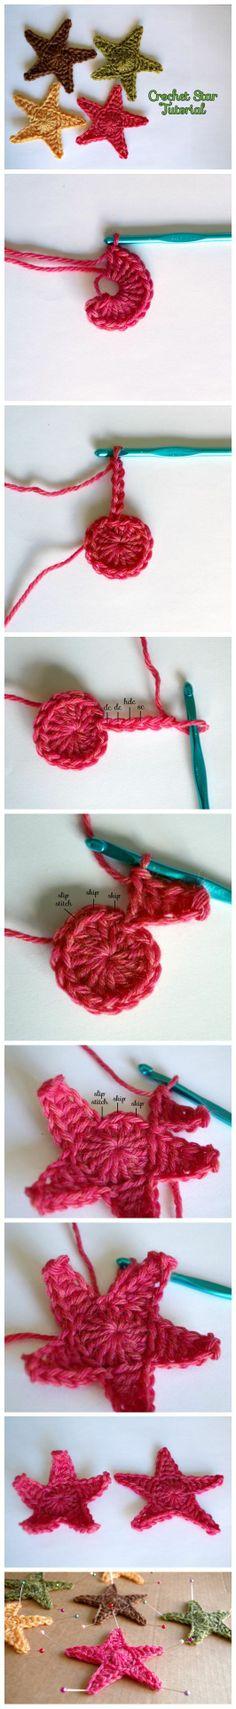 How to make a crochet star crochet diy, crochet amigurumi, crochet Crochet Diy, Crochet Gratis, Crochet Amigurumi, Crochet Motifs, Crochet Stitches, Simple Crochet, Crochet Appliques, Thread Crochet, Crochet Stars